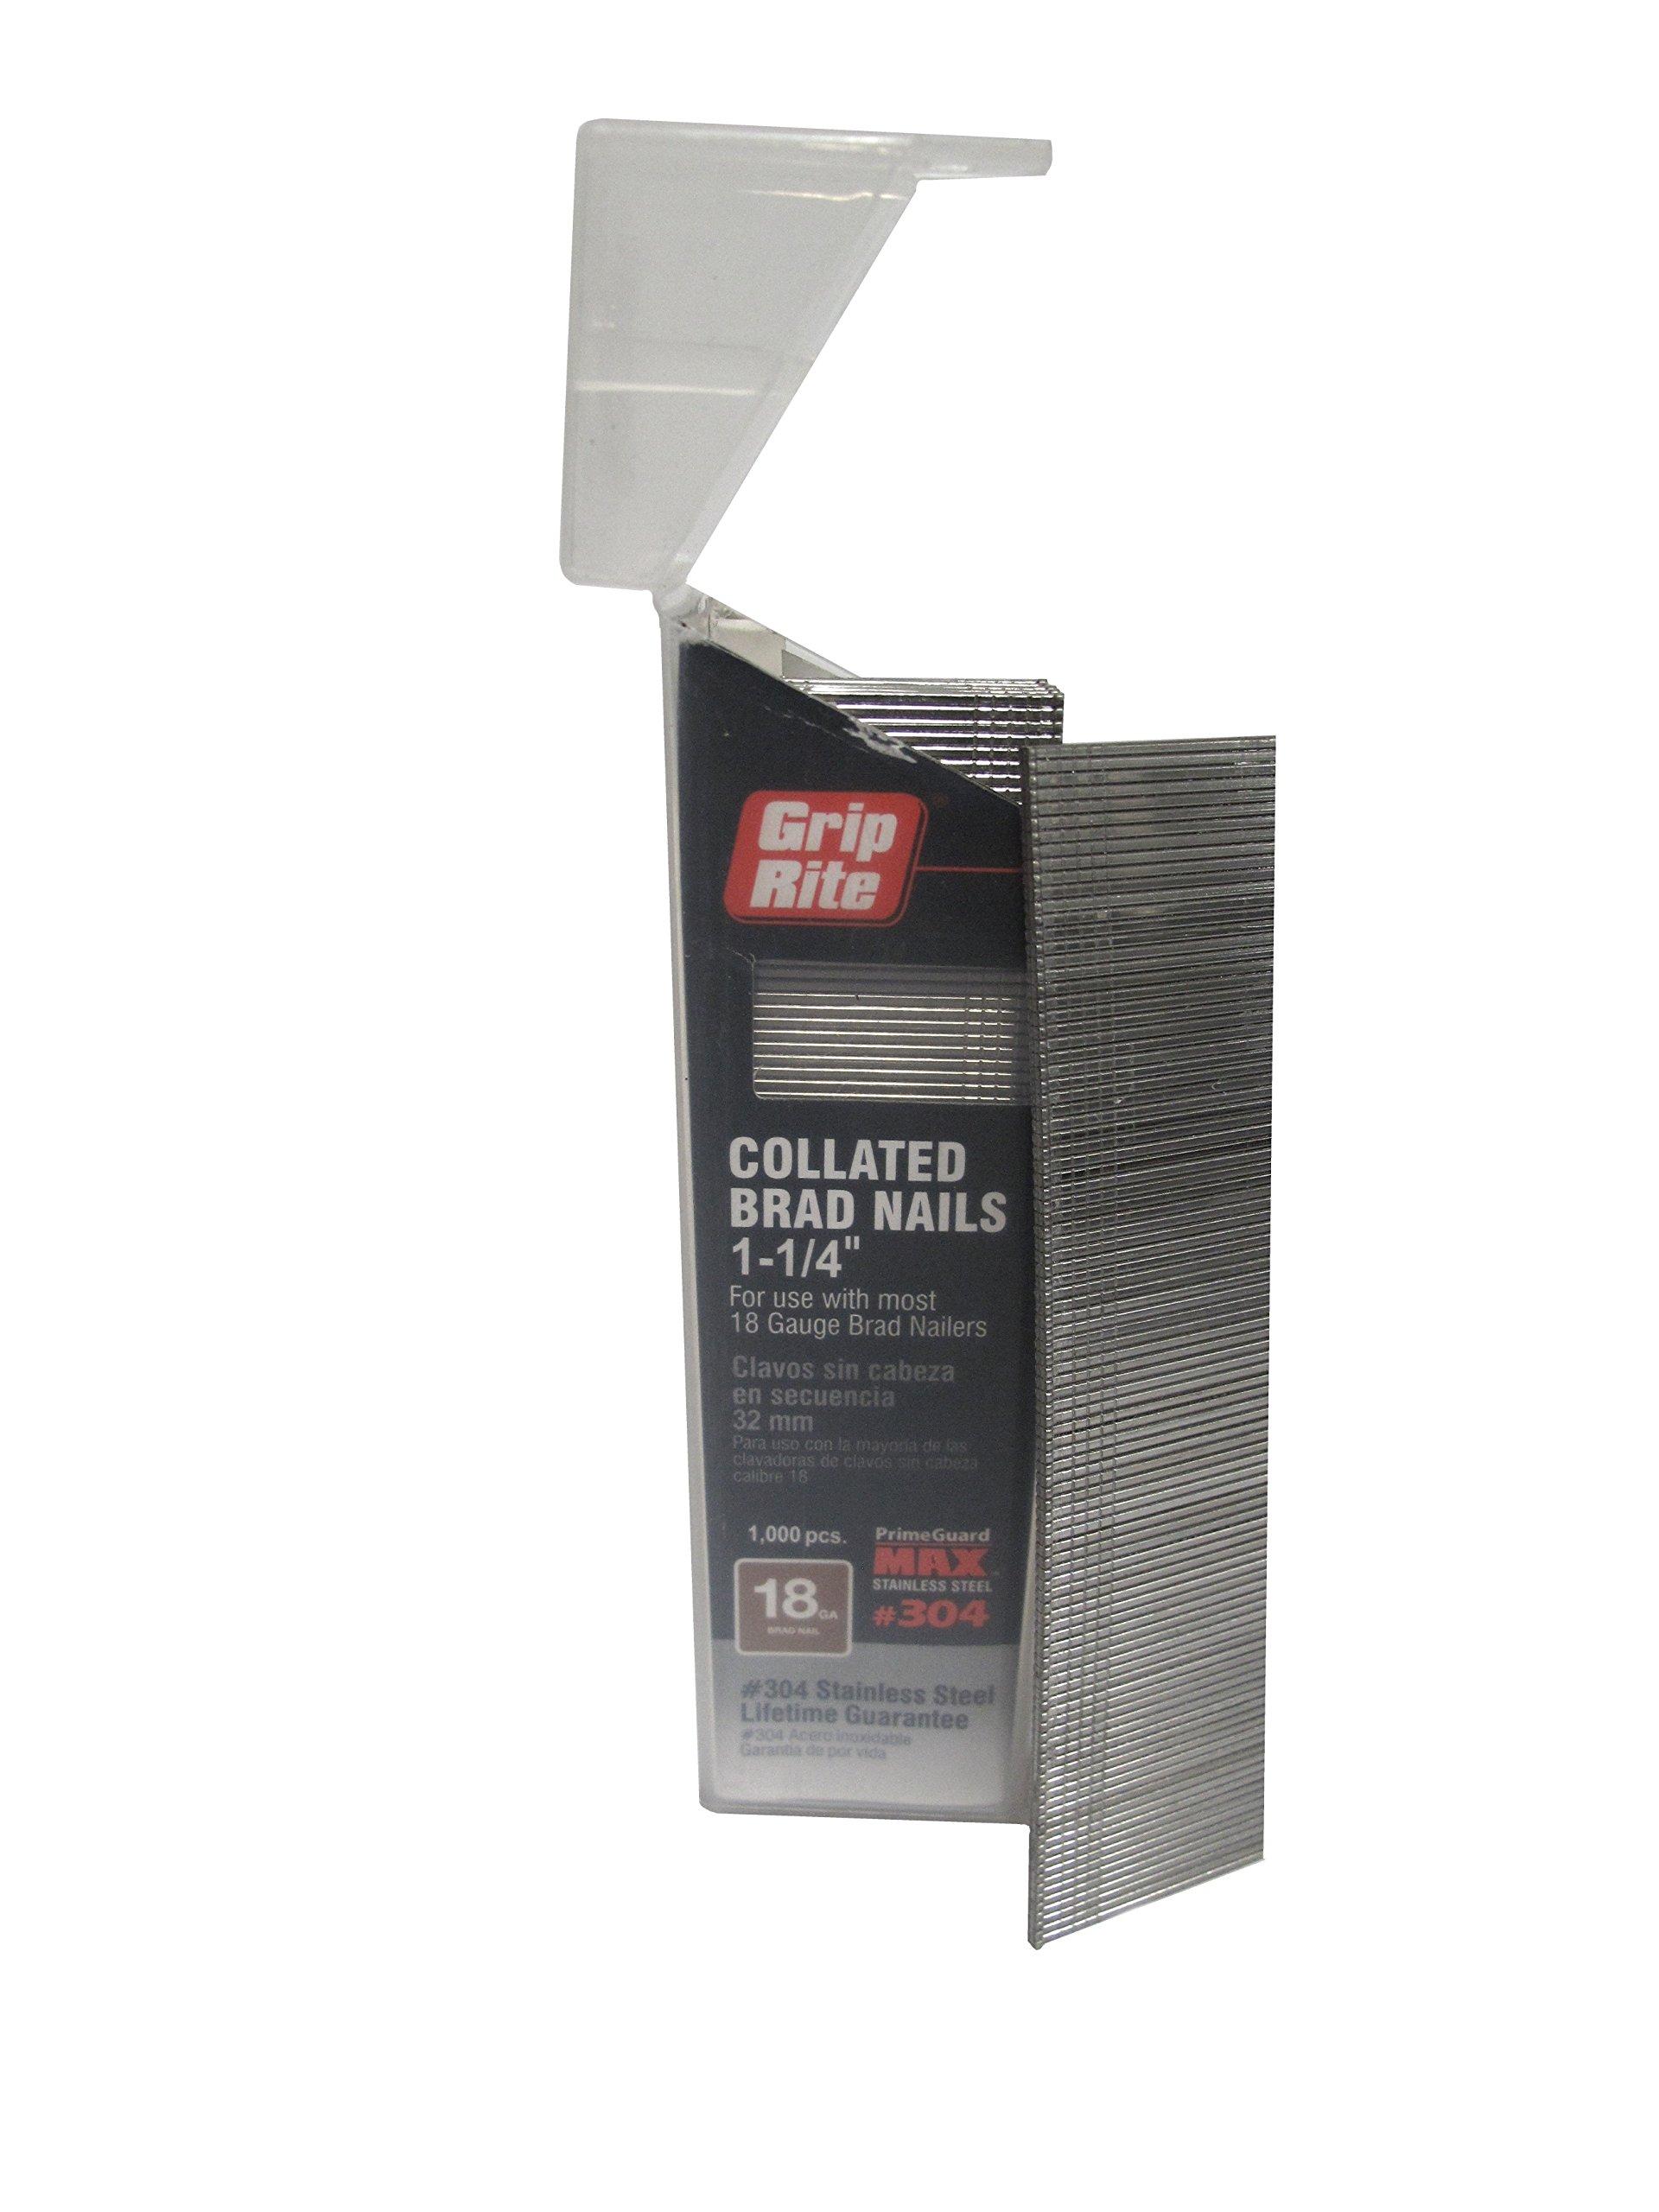 Grip Rite Prime Guard MAXB64876 18-Gauge 304-Stainless Steel Brad Nails in Belt-Clip Box (Pack of 1000), 1-1/4''